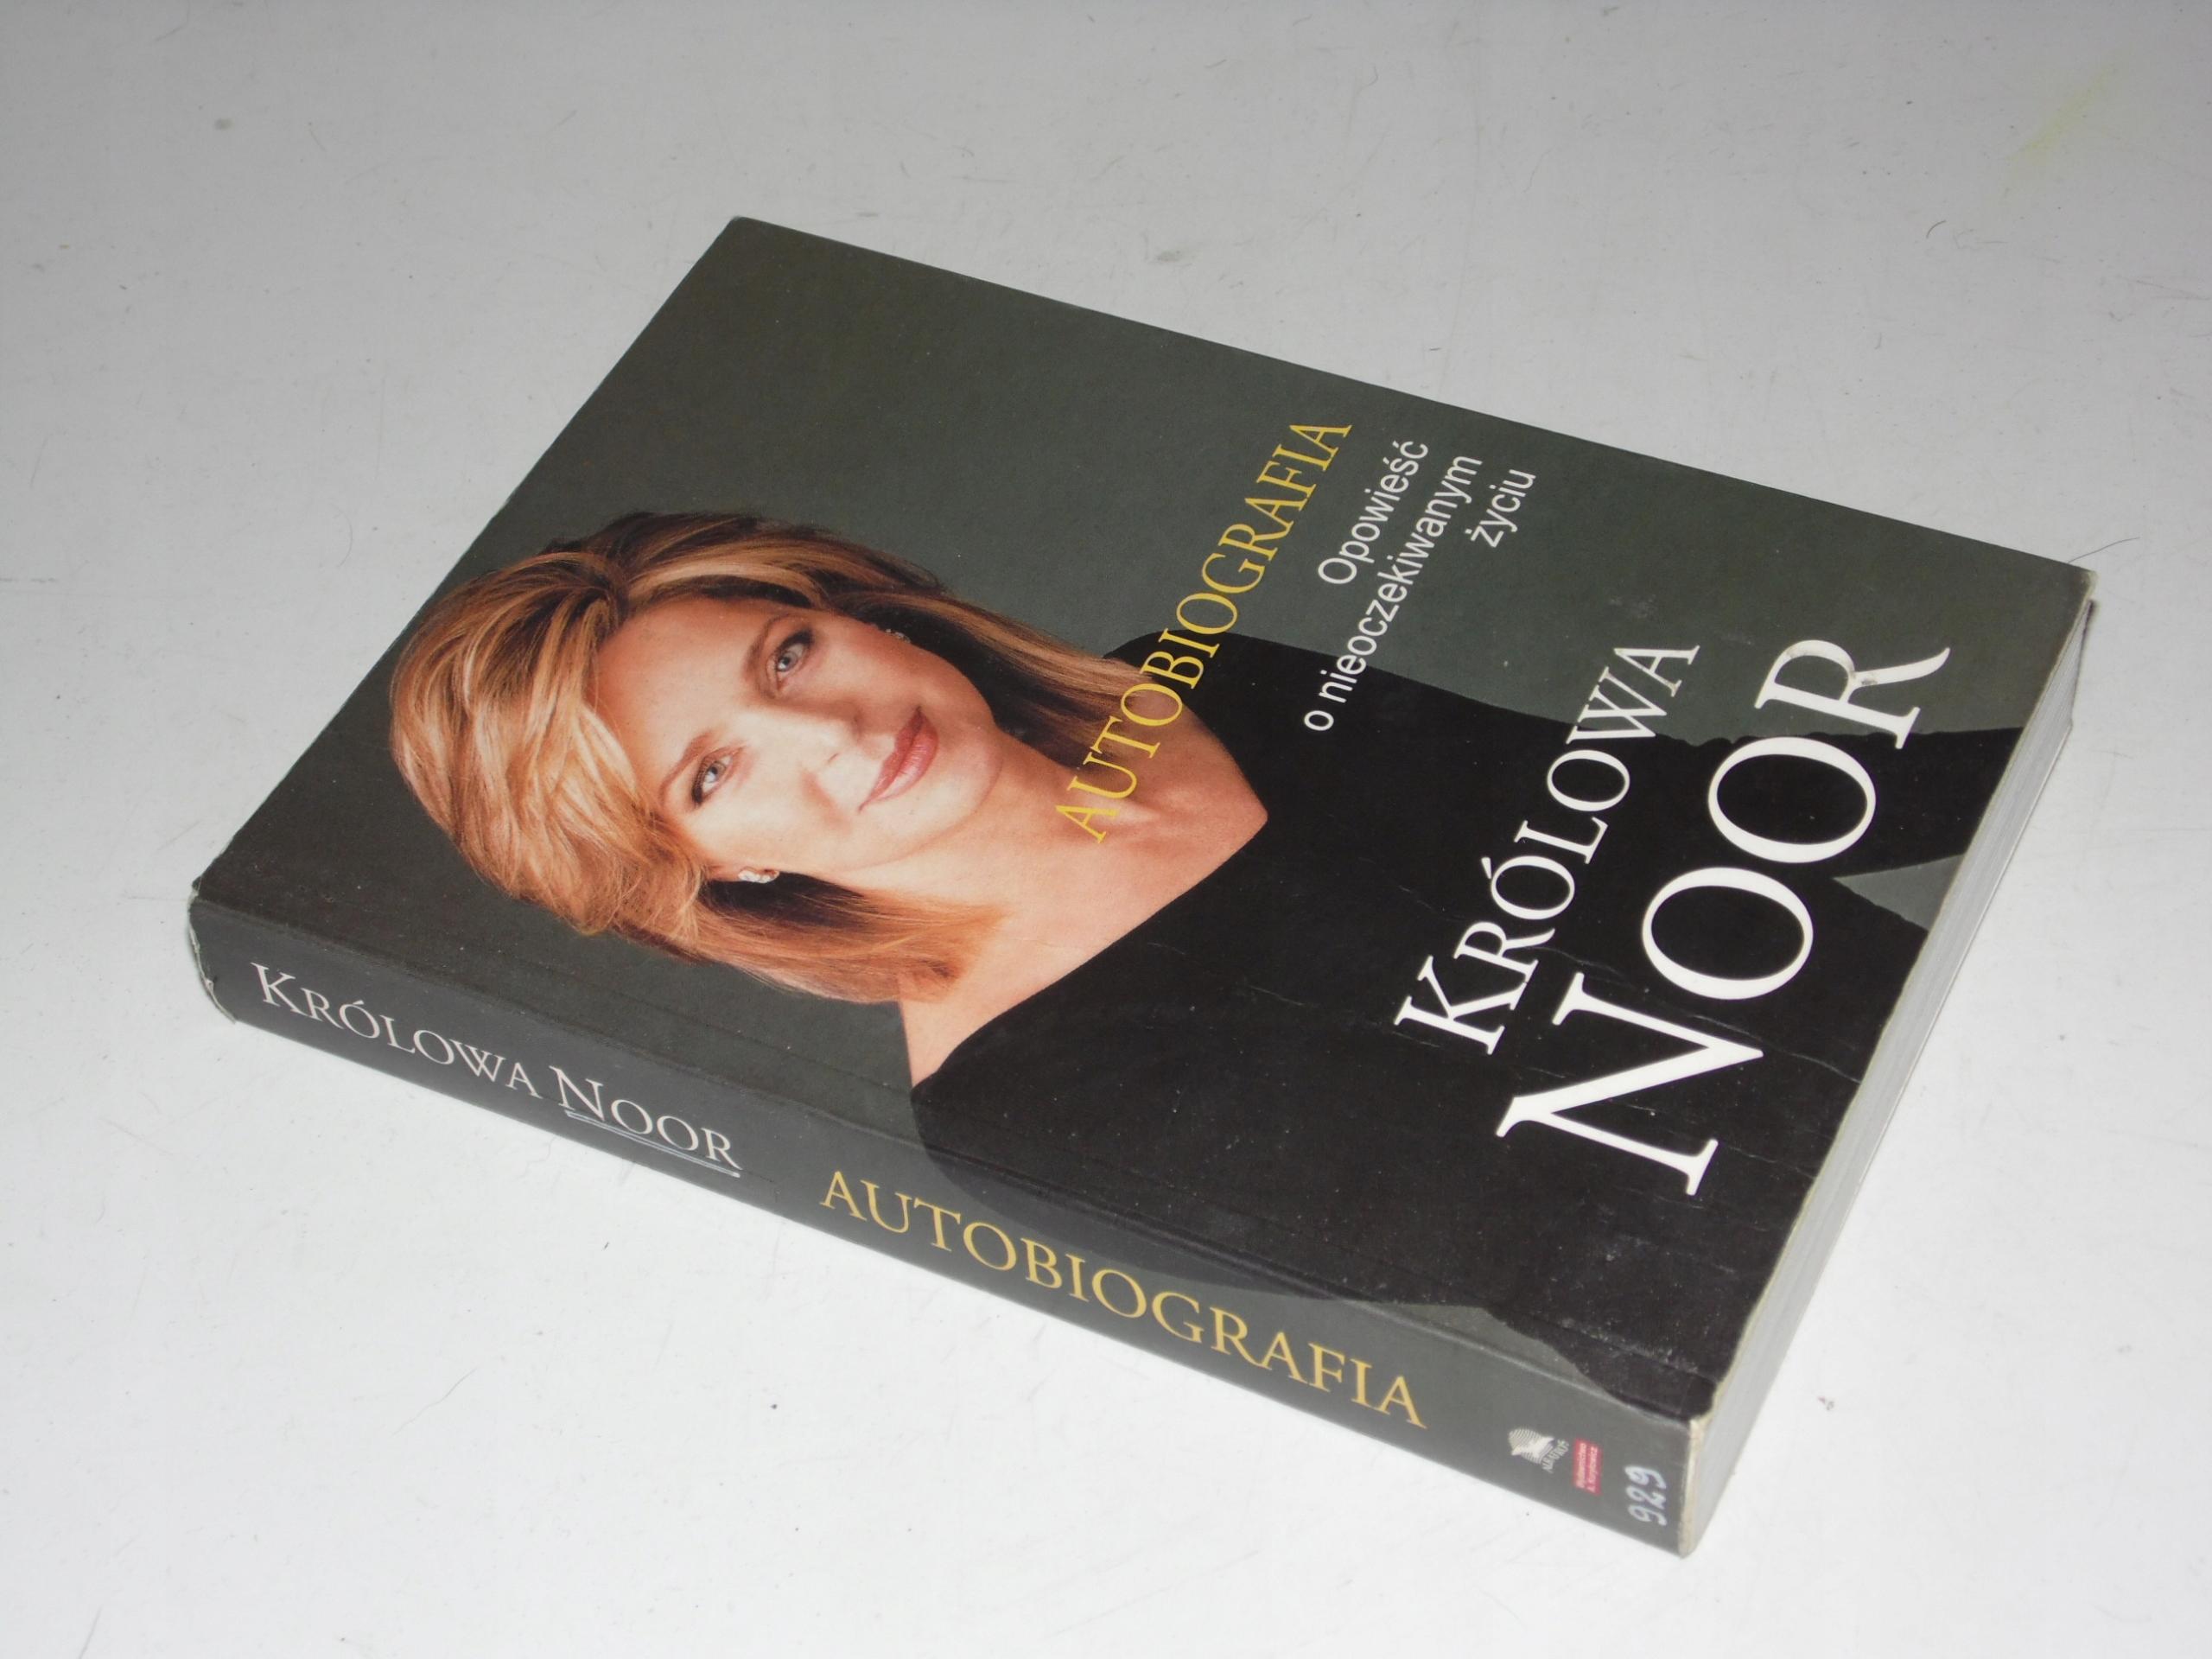 Autobiografia - Królowa Noor